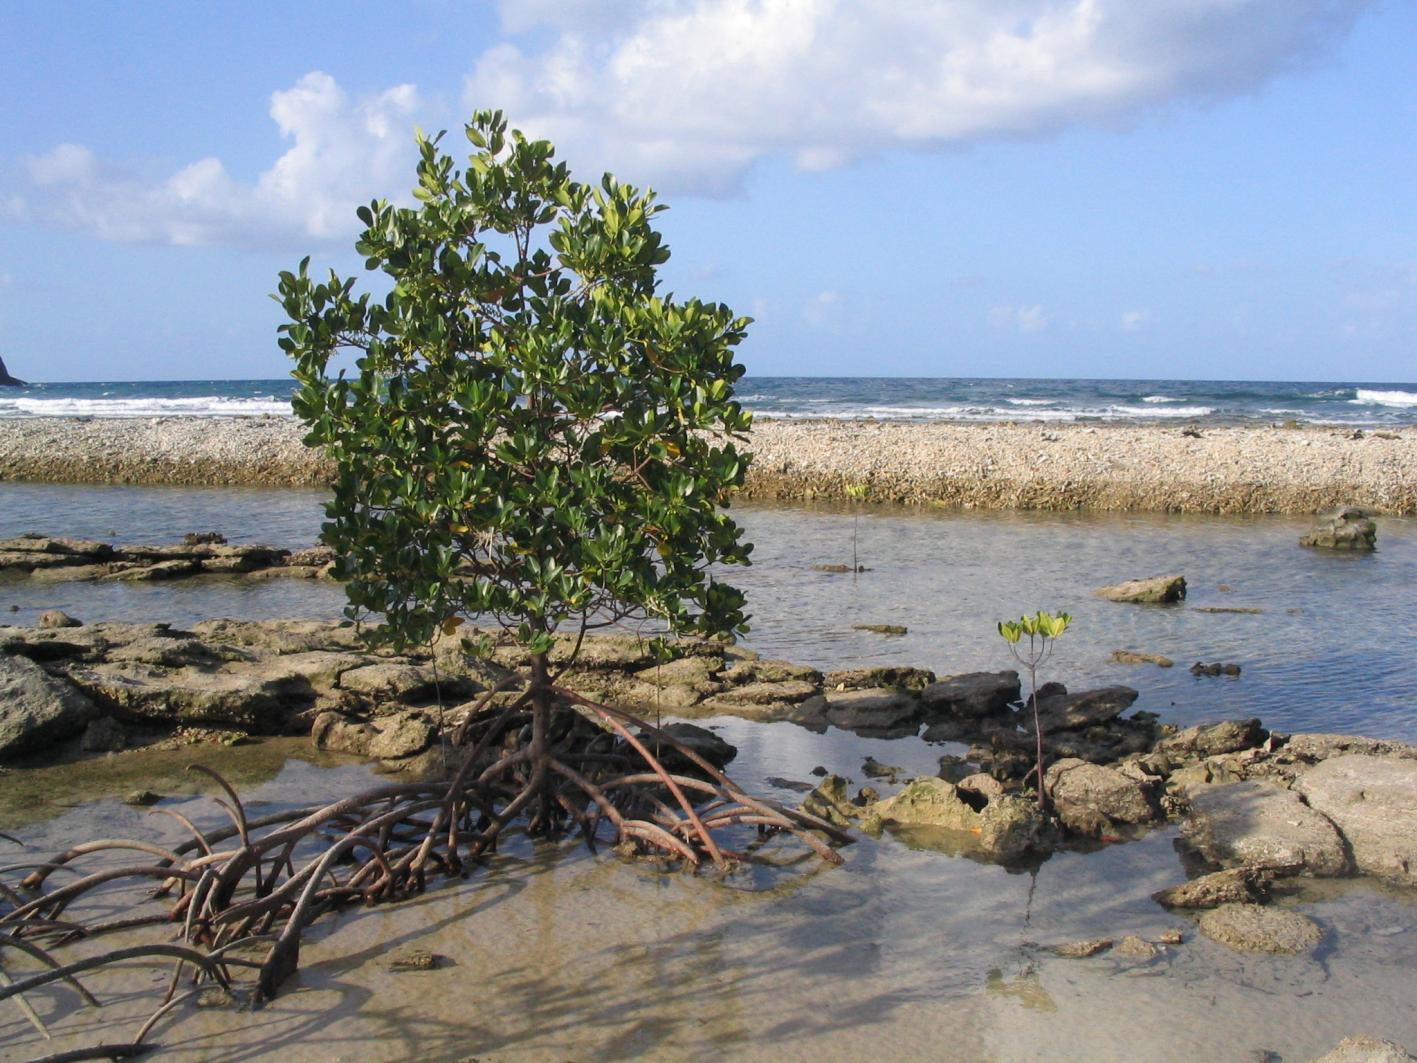 A red mangrove, Rhizophora mangle